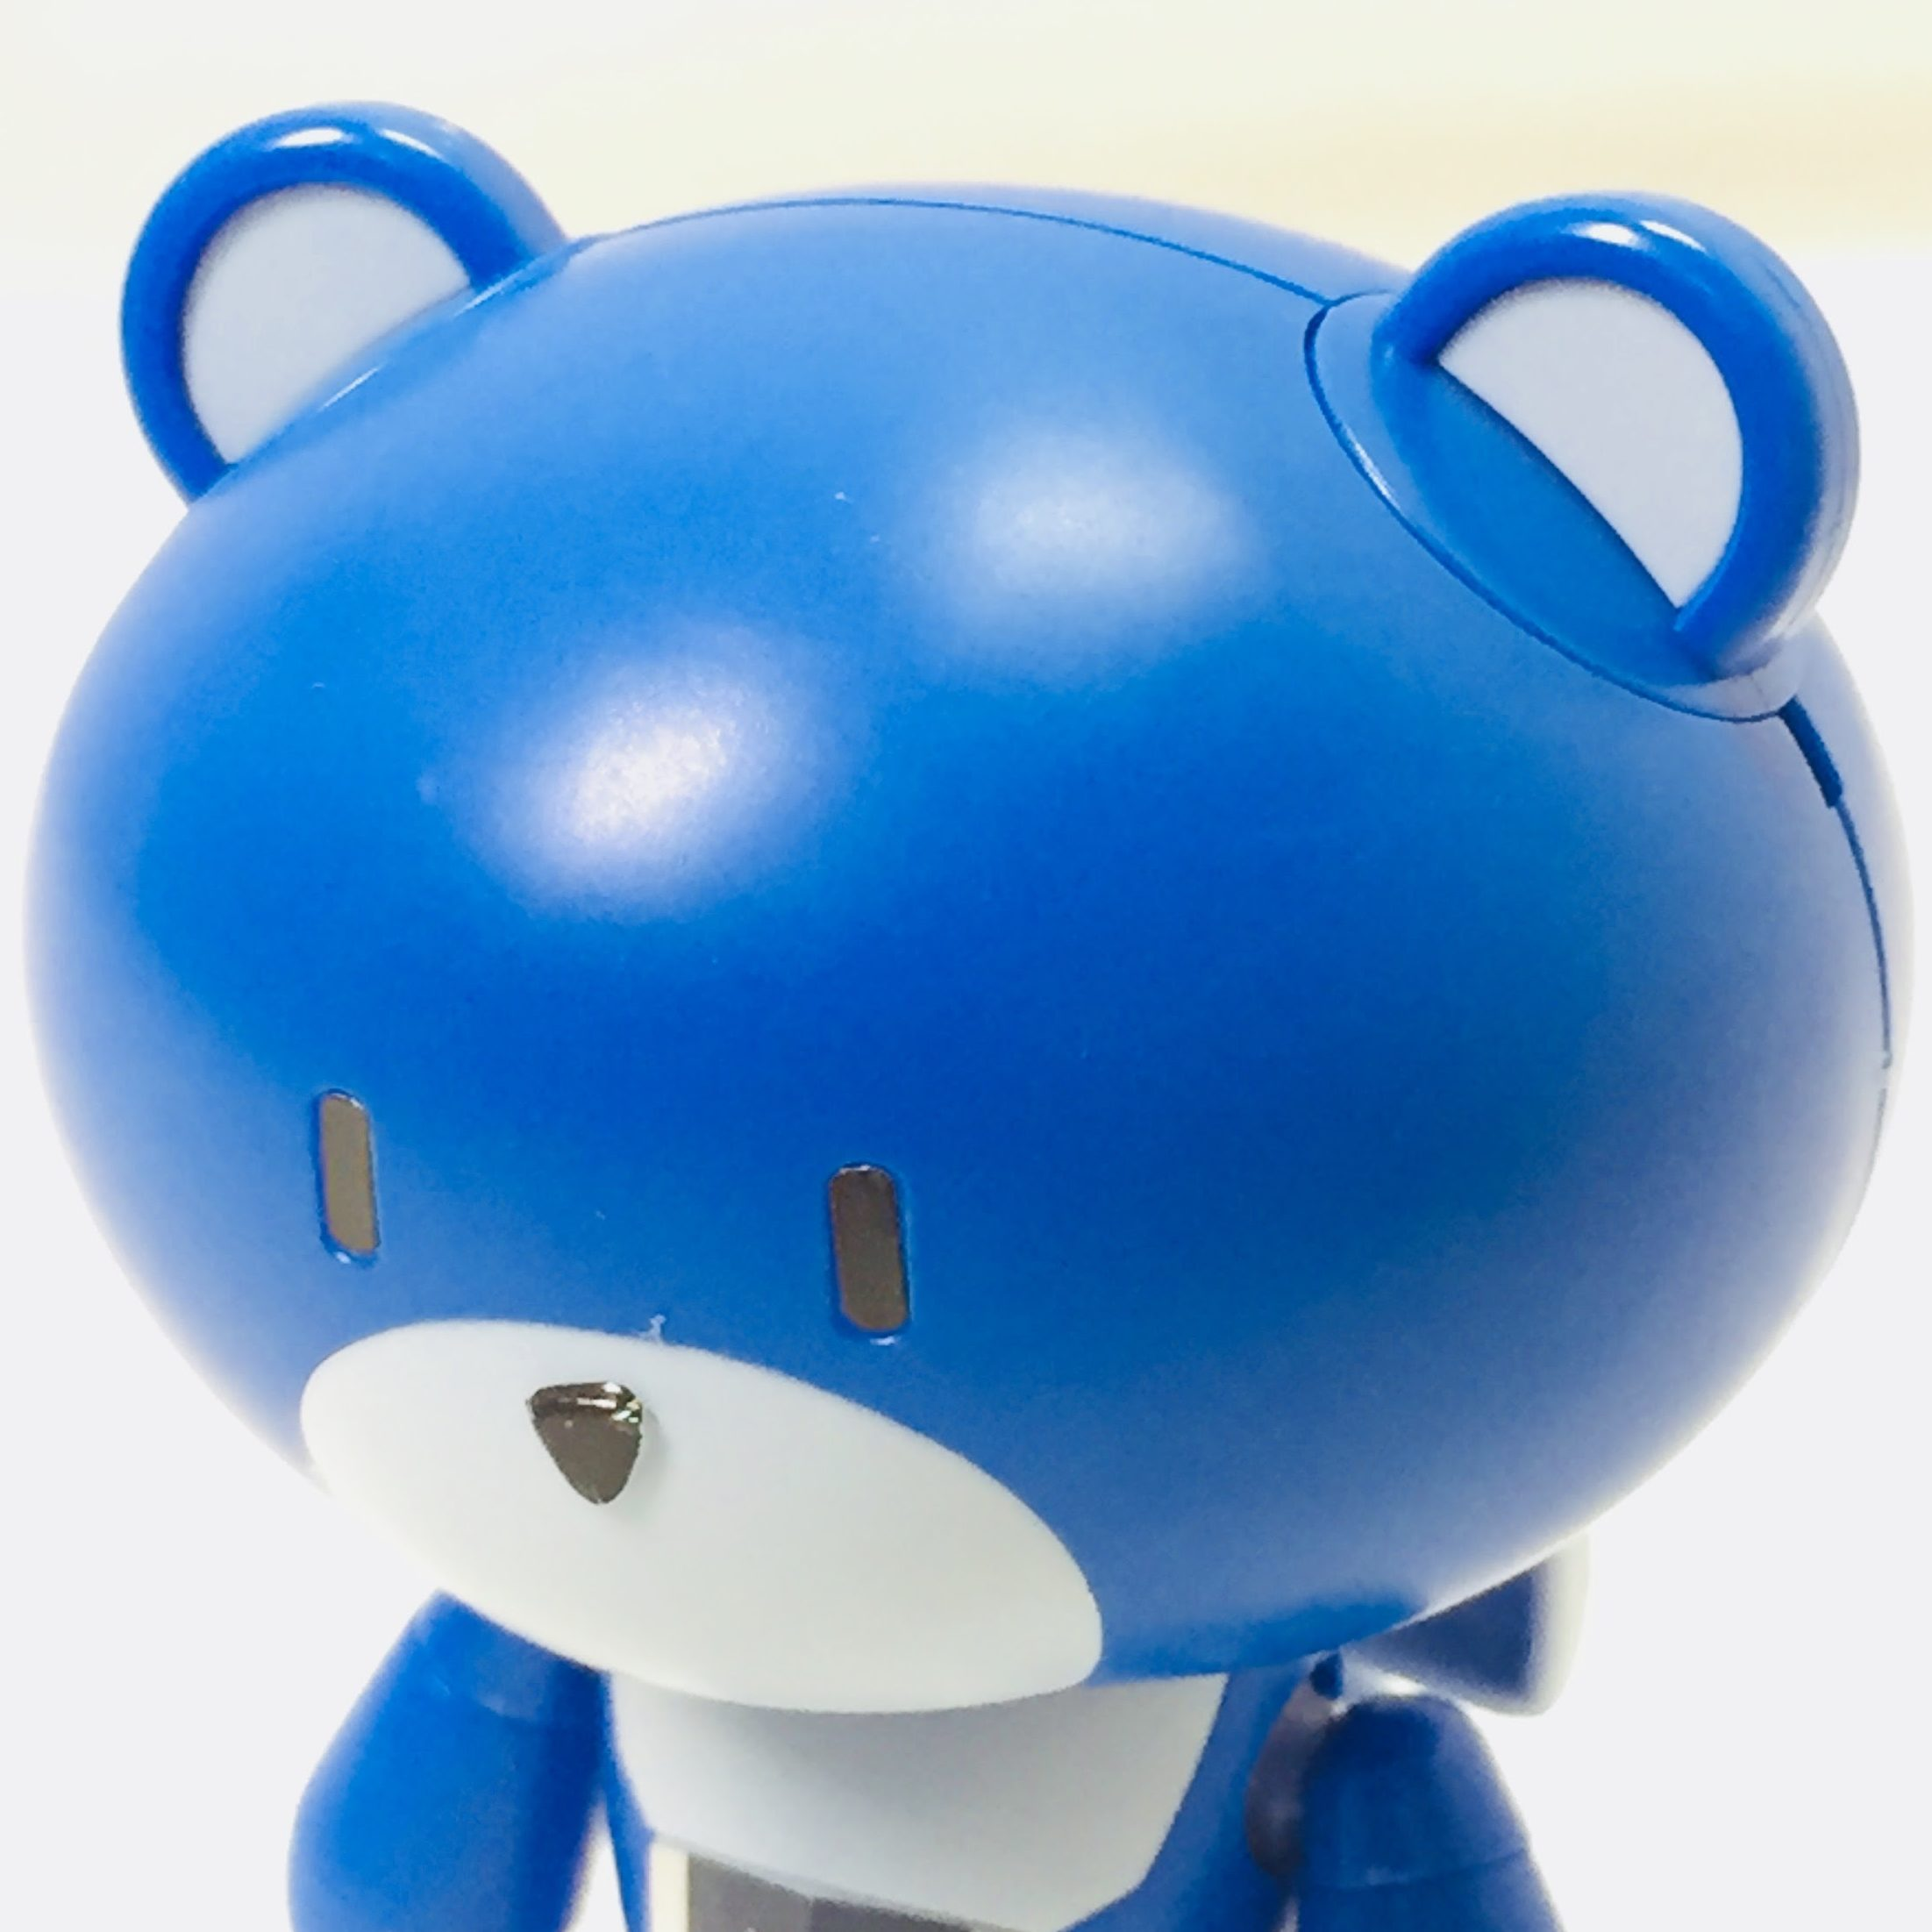 1/144 HG プッチガイ 刹那 セイエイ ブルー プラカード PETIT'GGUY SETSUNA F SEIEI BLUE PLACARD ガンダム00 ガンダムOO GUNDAM00 GUNDAMOO レビュー REVIEW